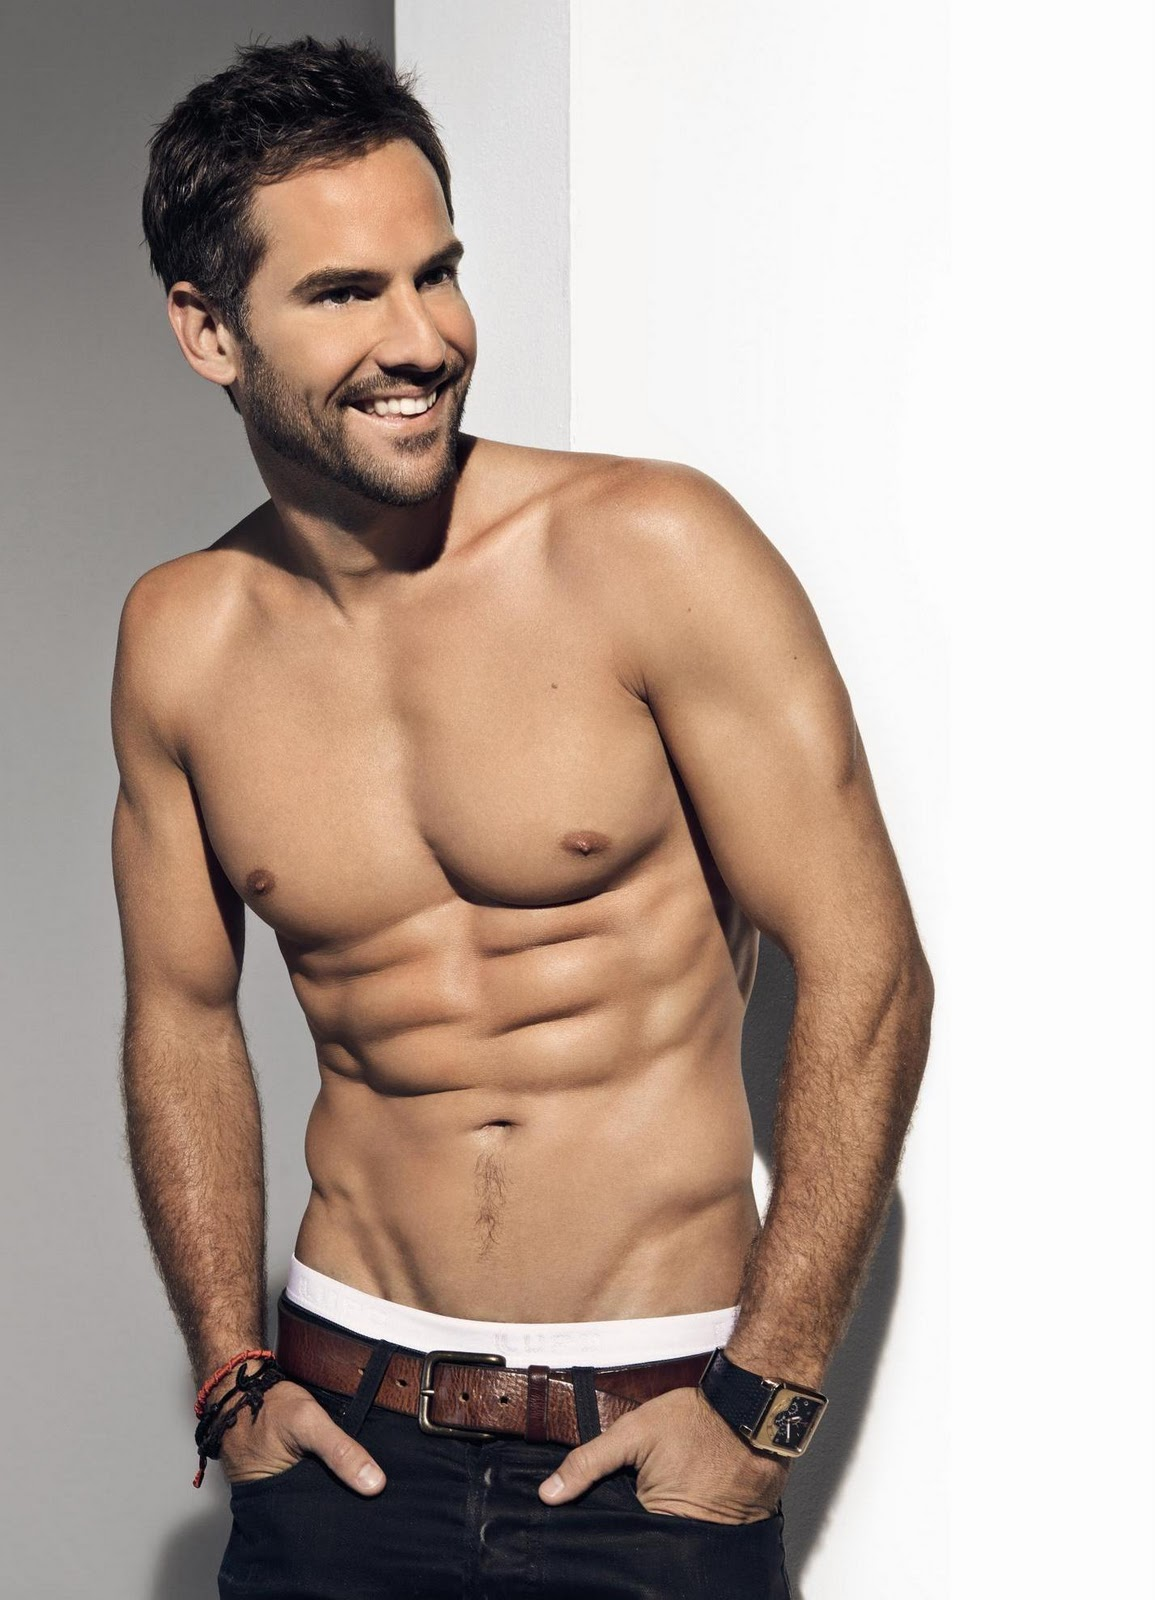 World's Sexiest Men of 2012